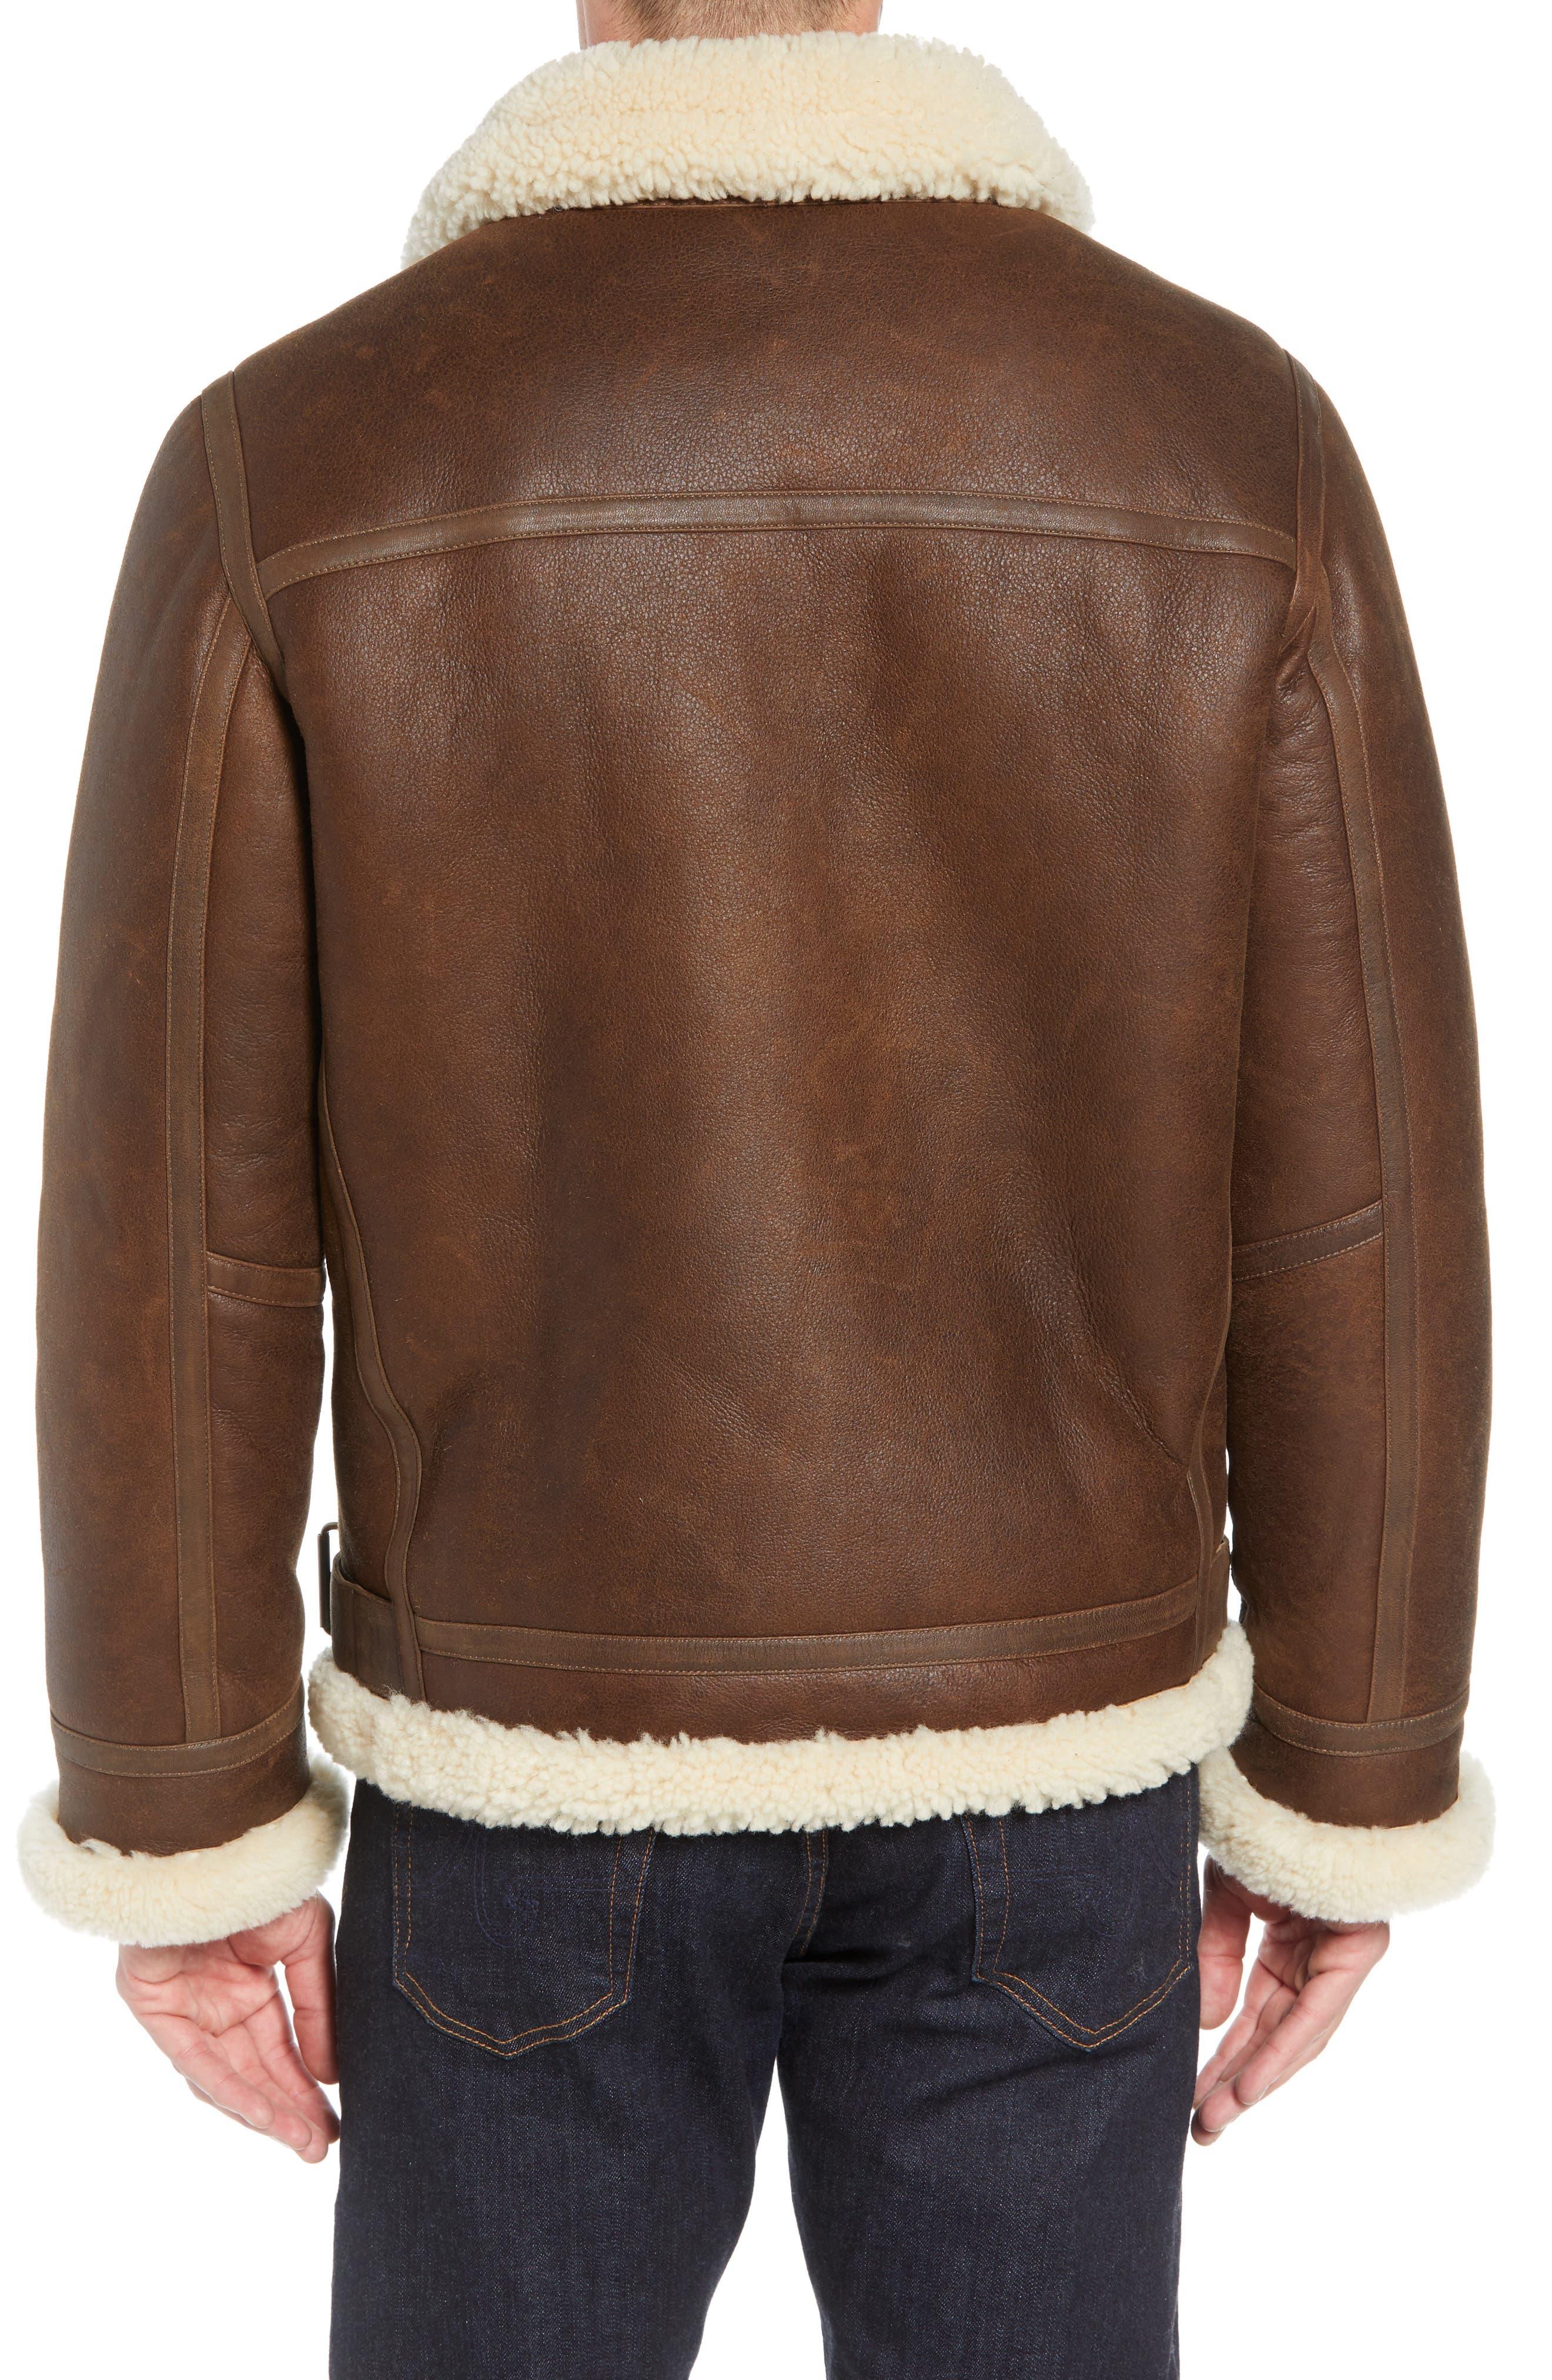 Auden Genuine Shearling Aviator Jacket,                             Alternate thumbnail 2, color,                             CHESTNUT